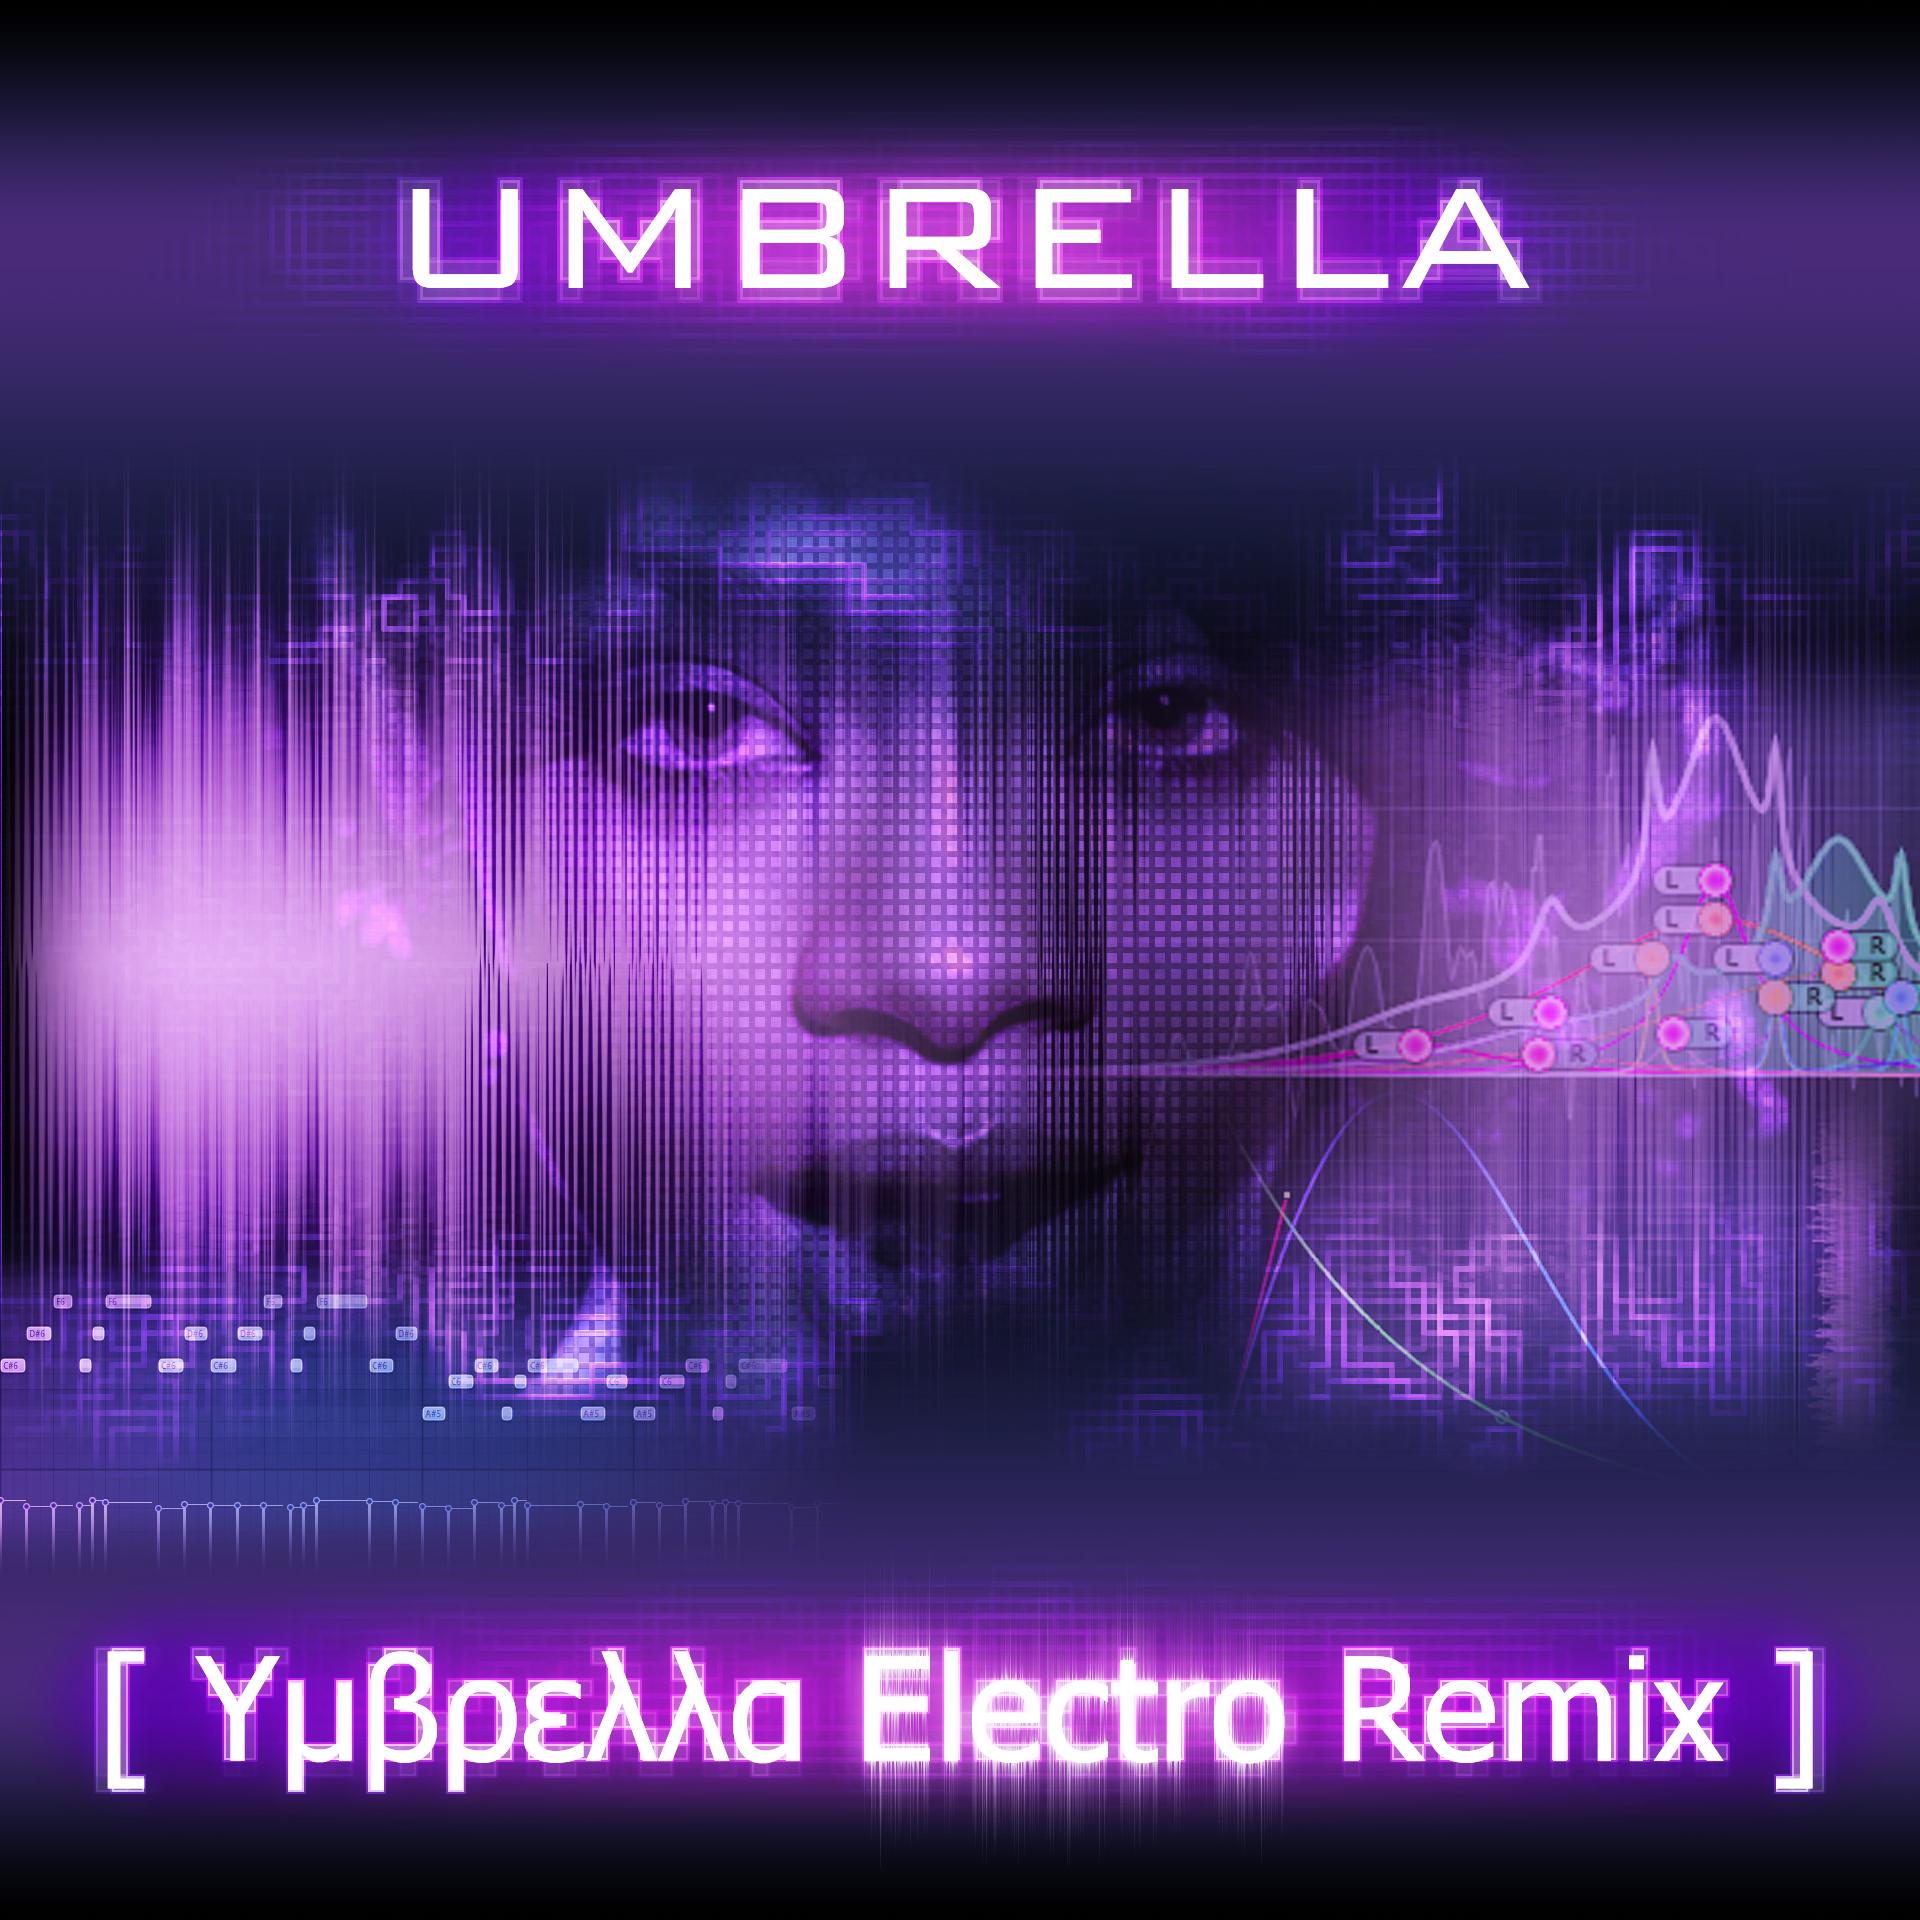 Rihanna umbrella mv umbrella ft jay z gif on gifer by lightseeker.